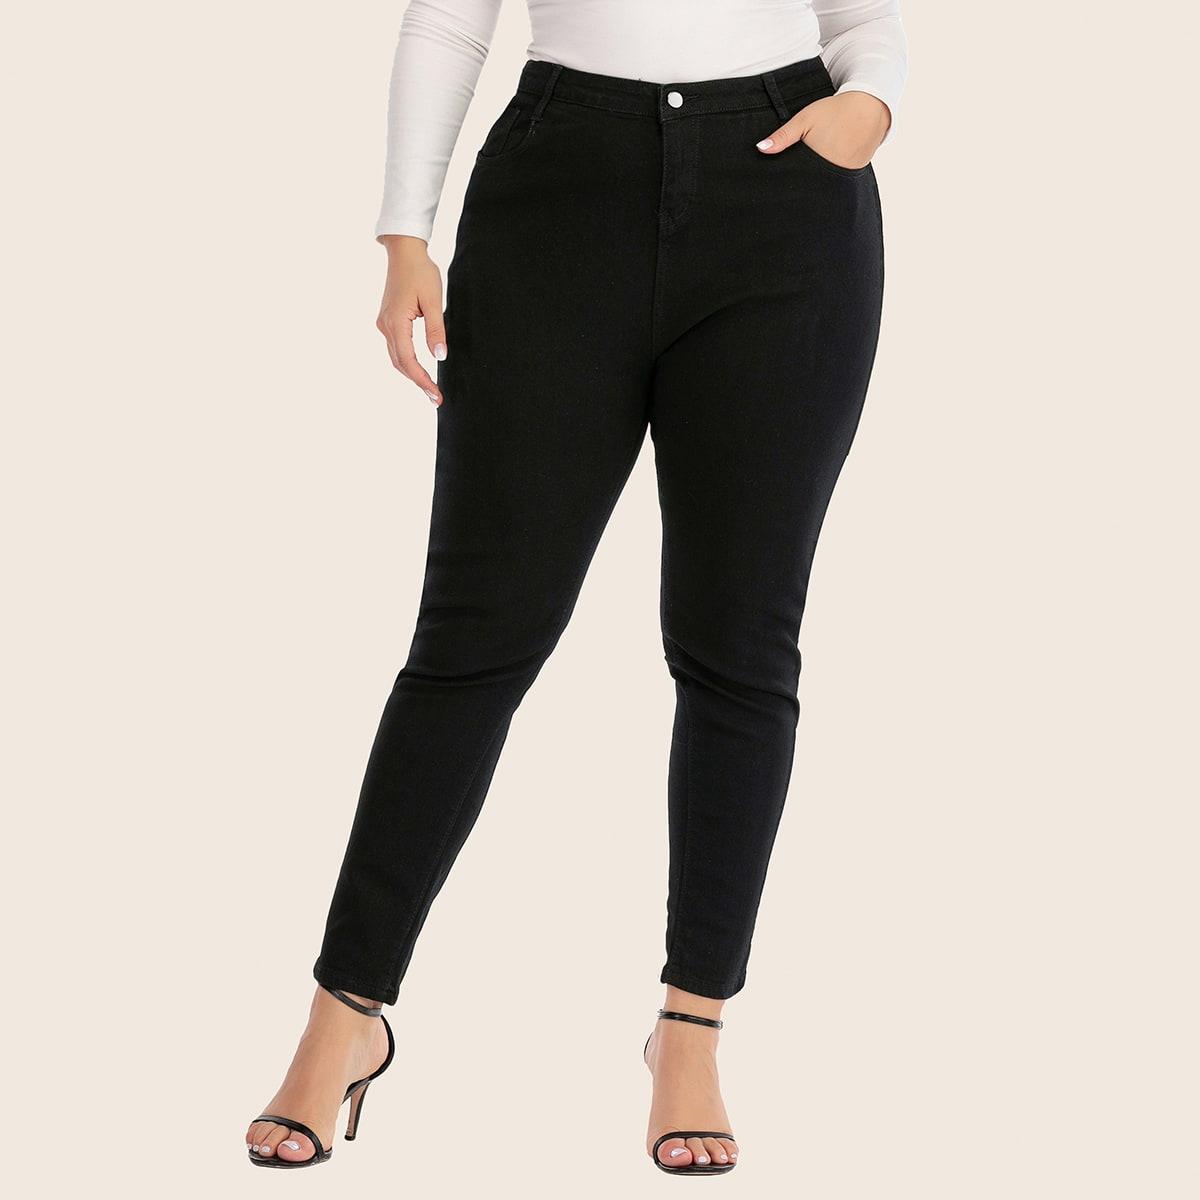 Zwart Casual Vlak Grote maten: jeans